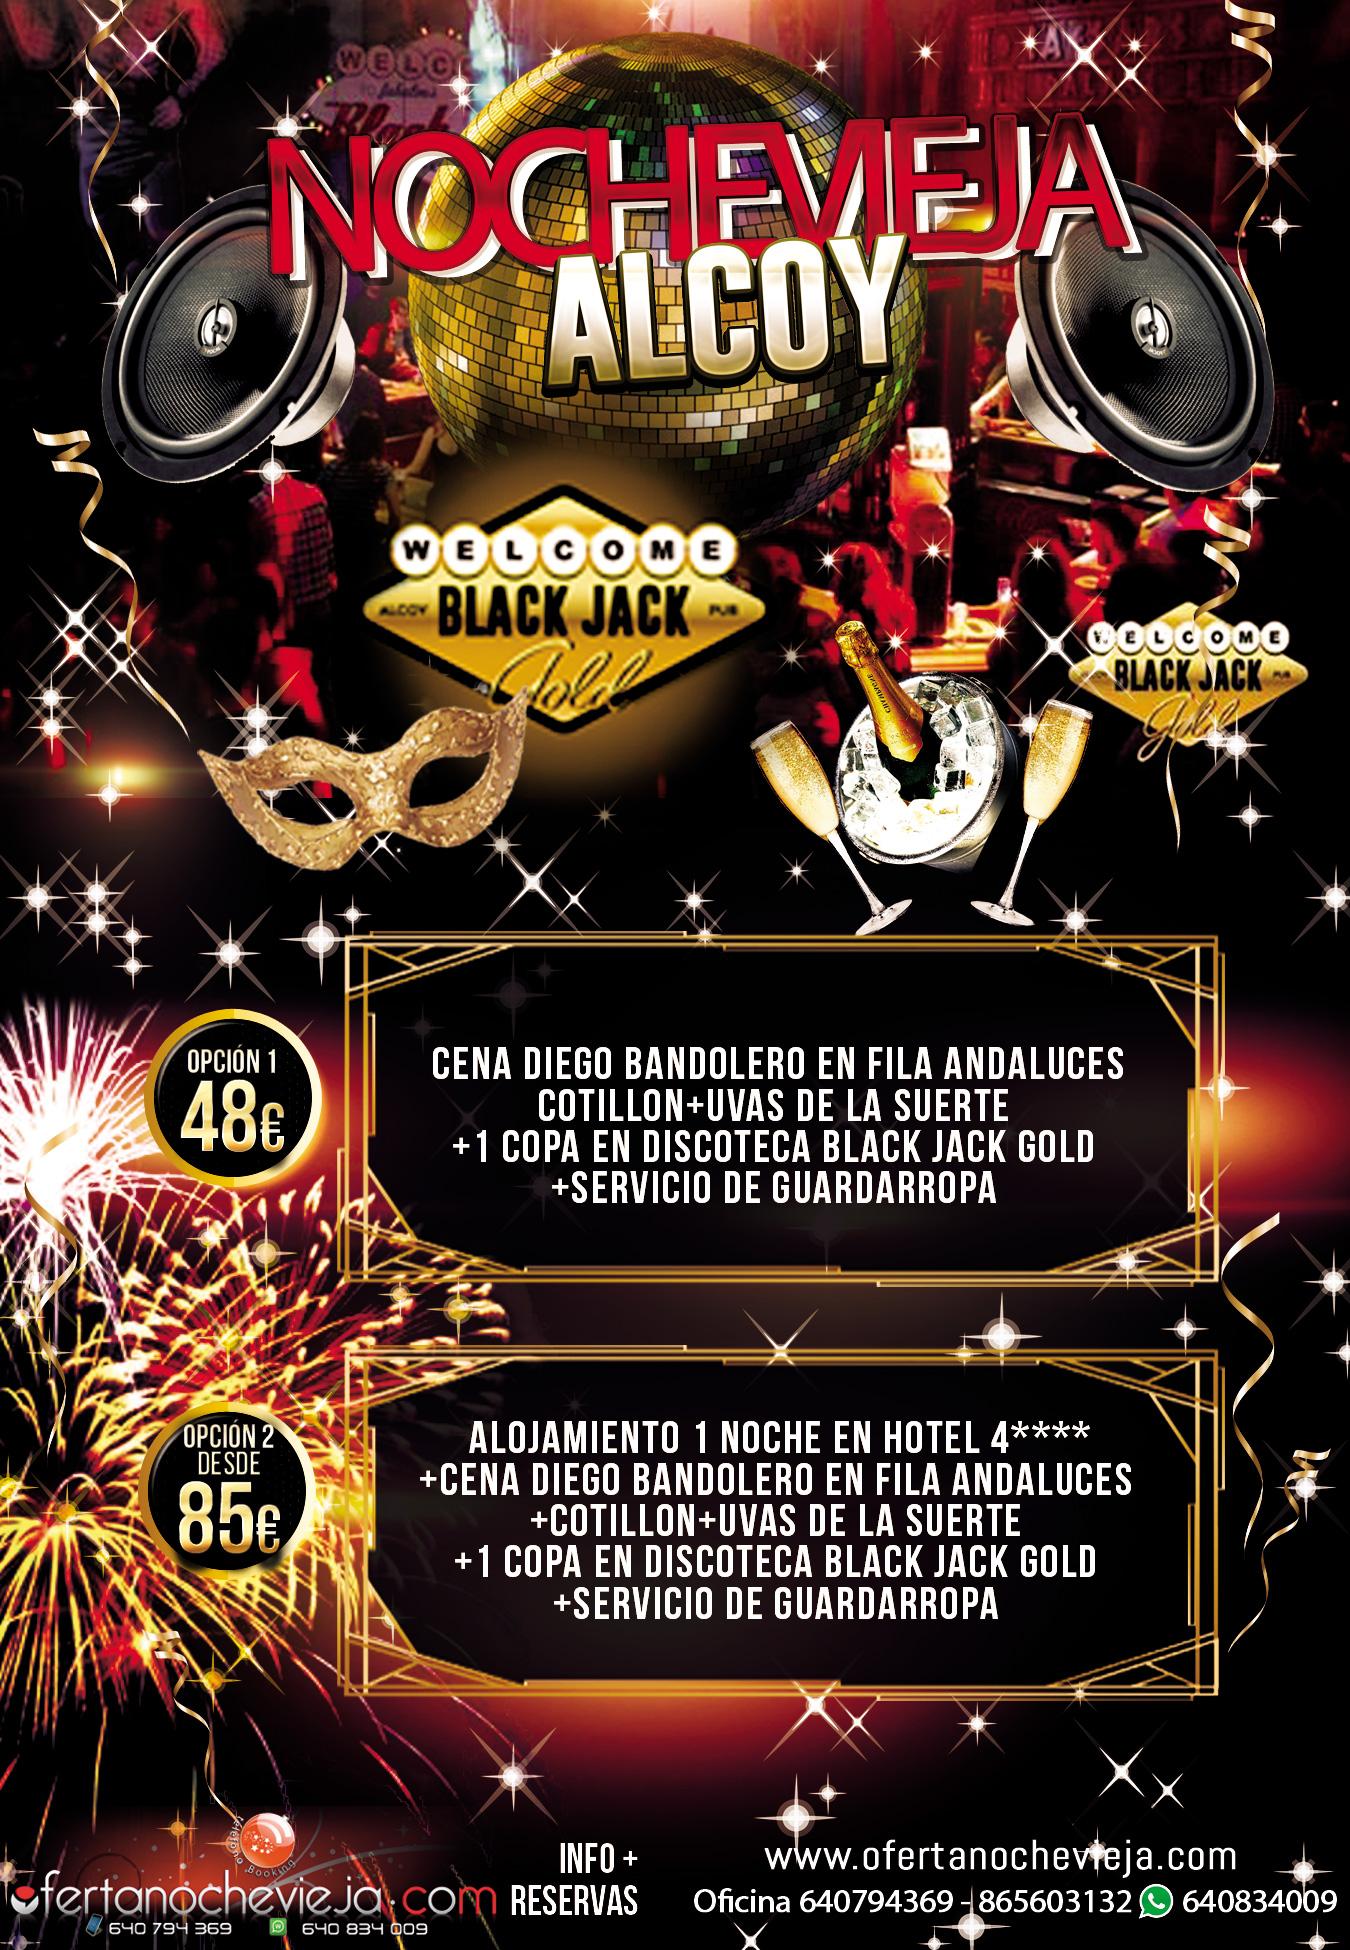 alcoy-black-jack-gold-nochevieja-2016-web